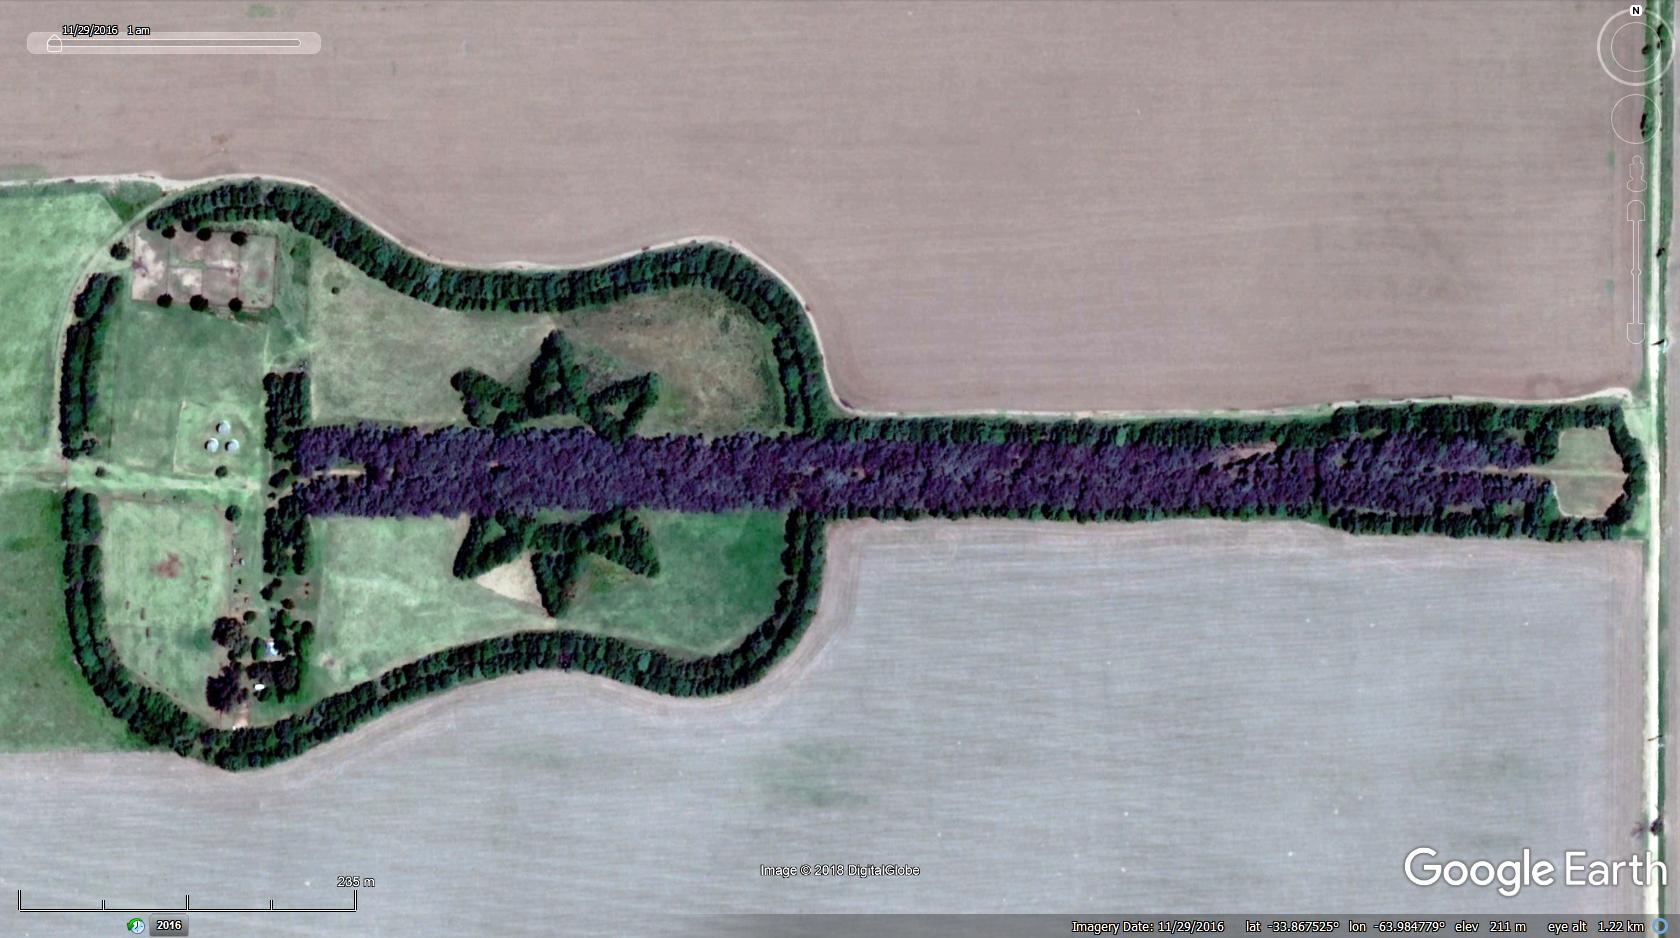 Man-Plants-Guitar-Shaped-Forest-in-Memory-of-His-Wife,pedro-martin-ureta, pedro-martin-ureta-google-maps, pedro-martin-ureta-tree-guitar, pedro-martin-ureta-forest-guitar, pedro-martin-ureta-guitar, pedro-martin-ureta-guitarra,